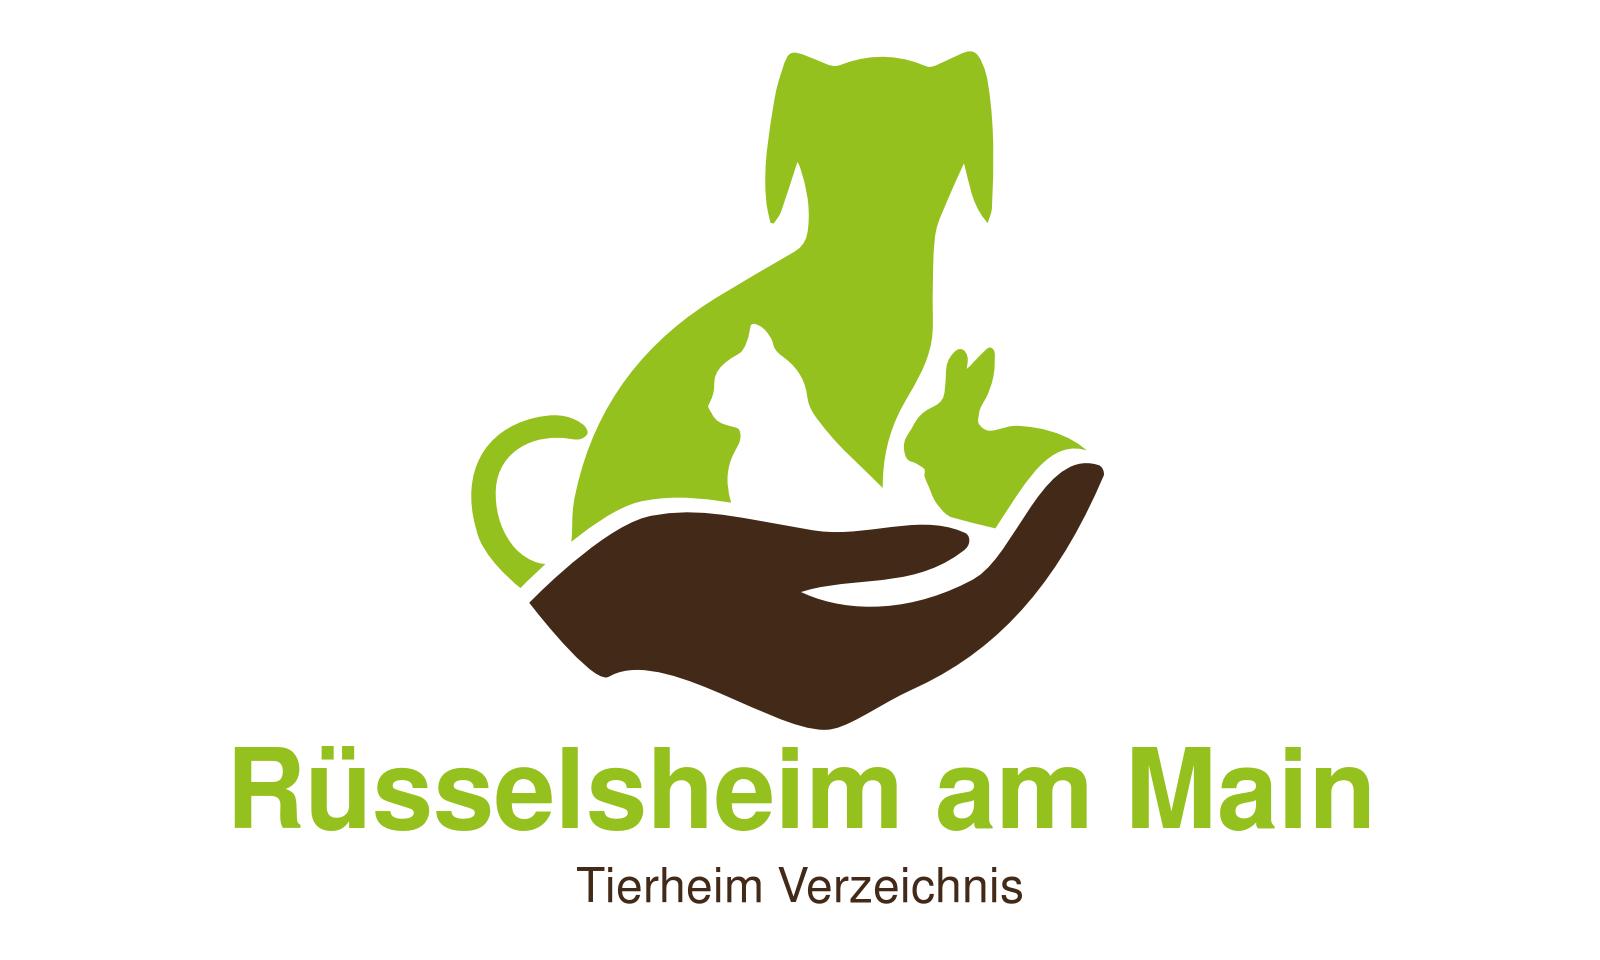 Tierheim Rüsselsheim am Main